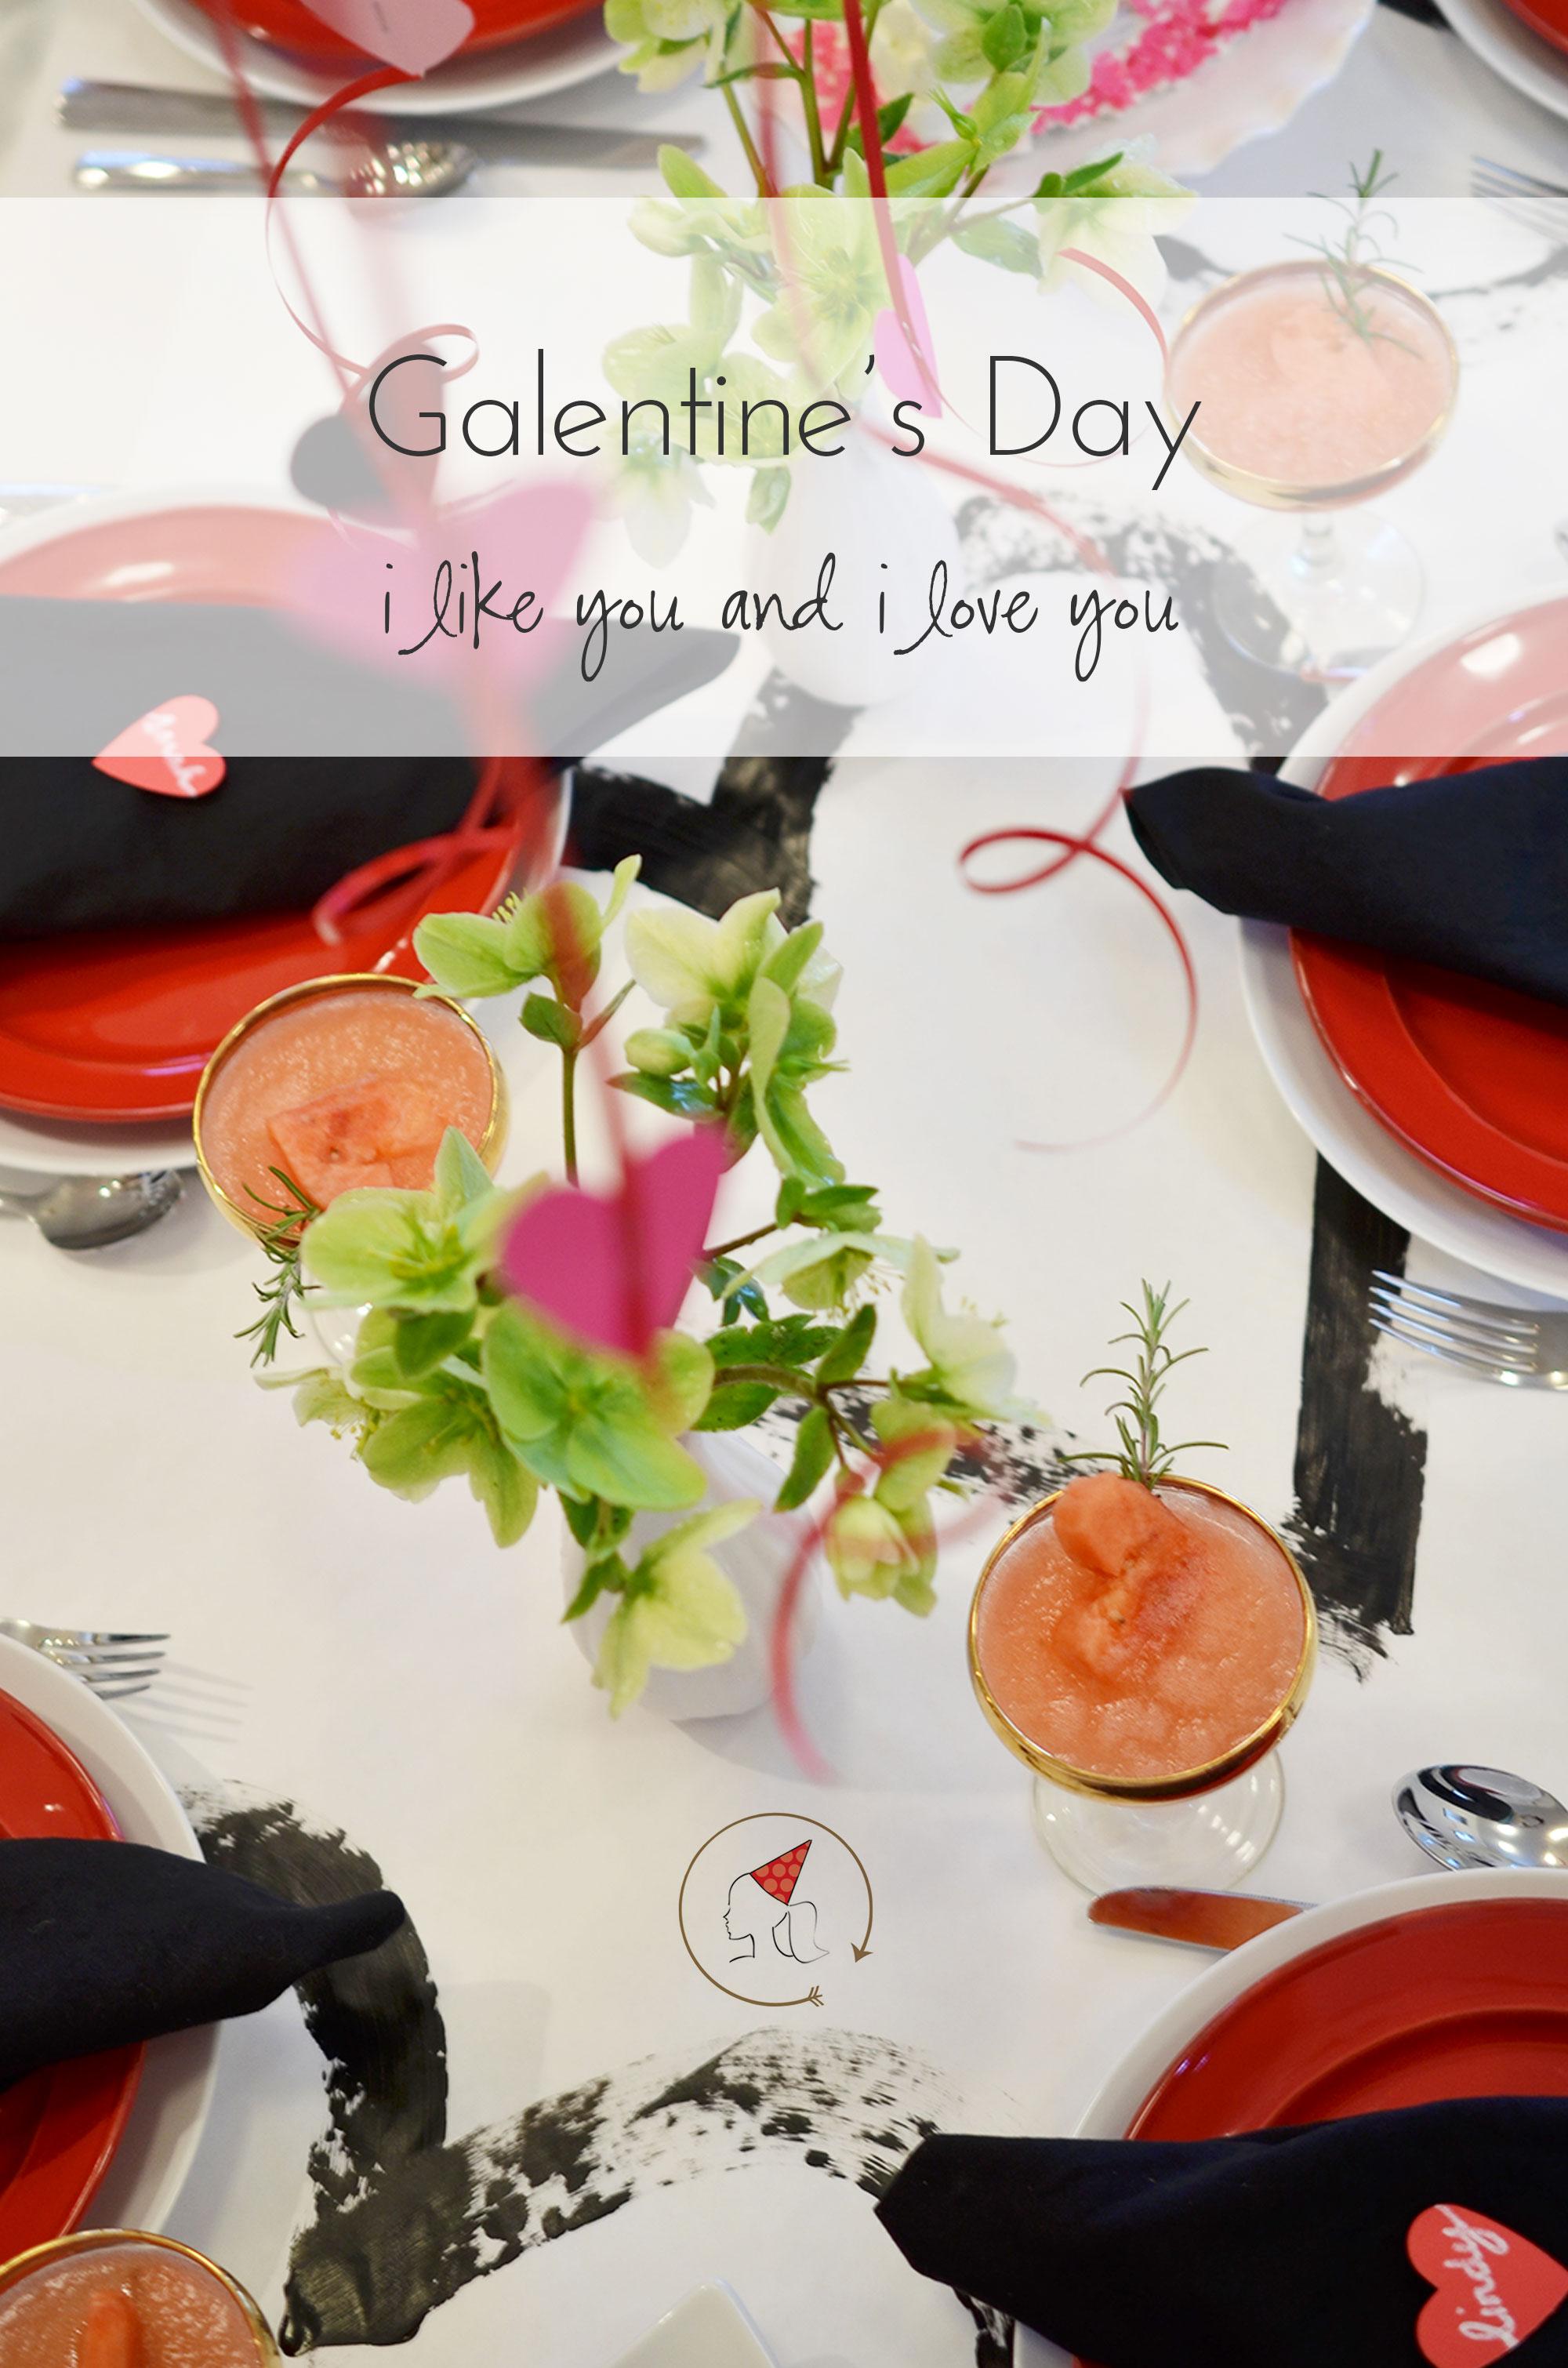 Ali Hedin | Galentine's Day